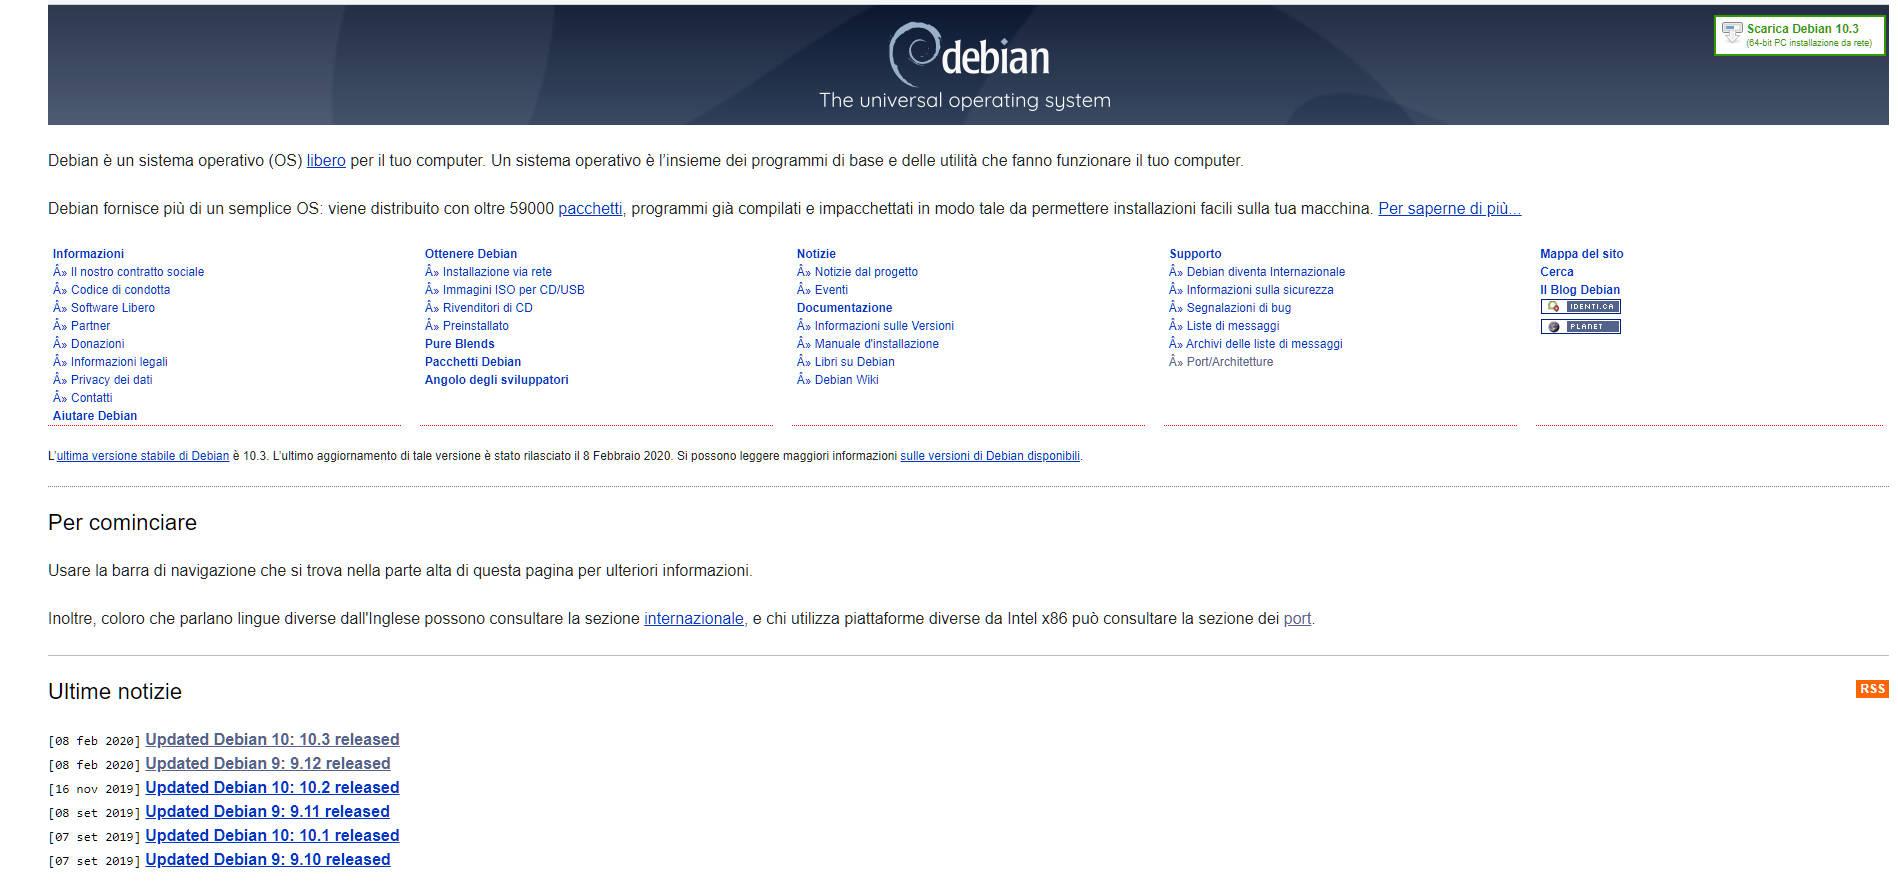 Debian home page